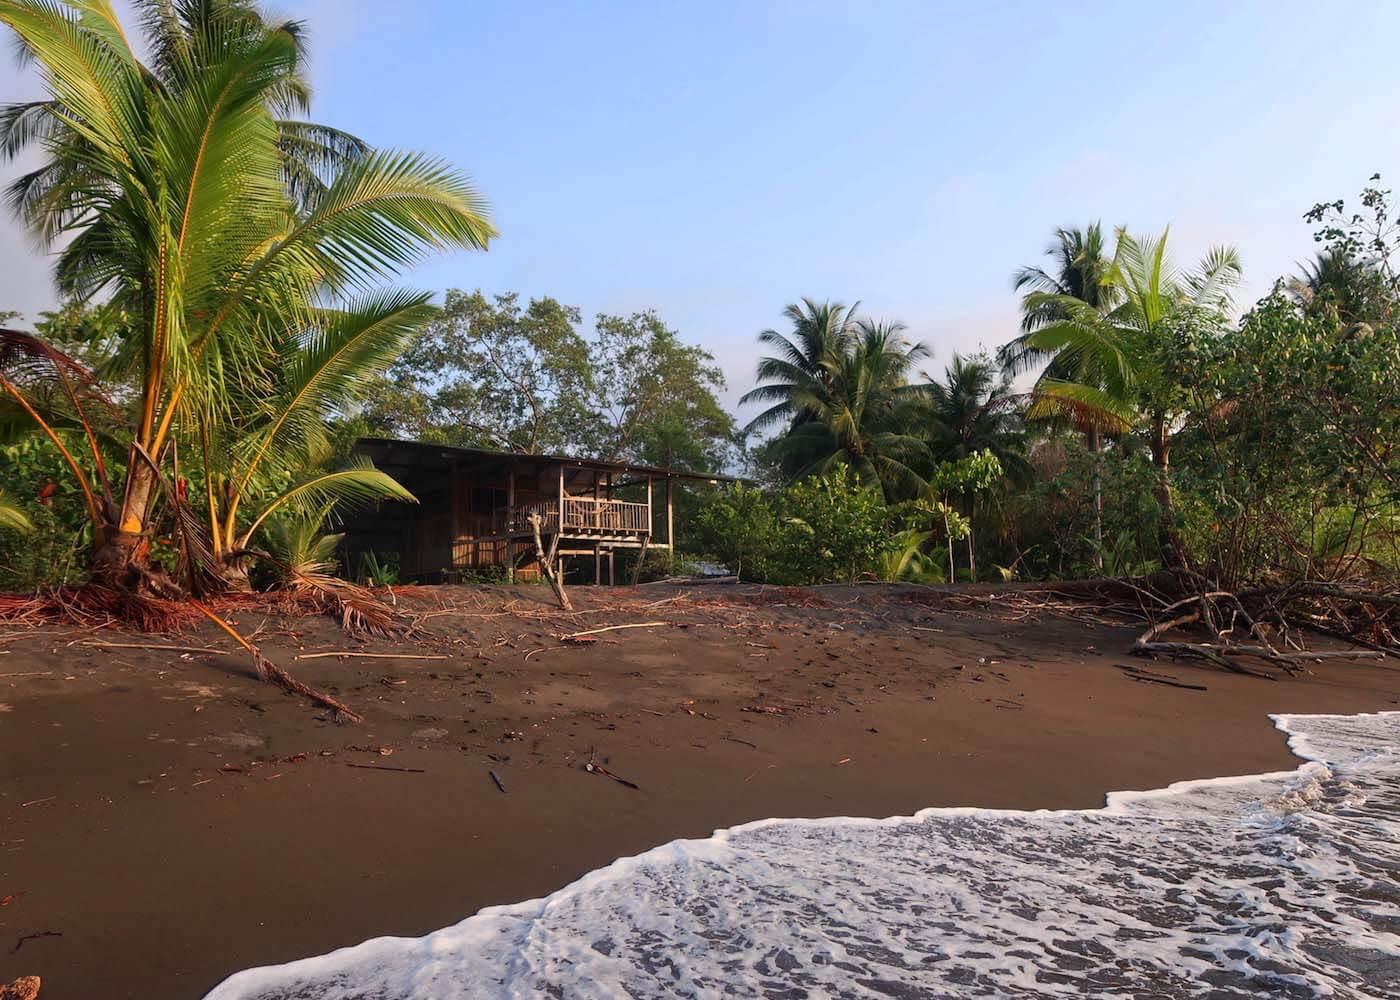 Beach hut and Pacific shore by Bahia Solano